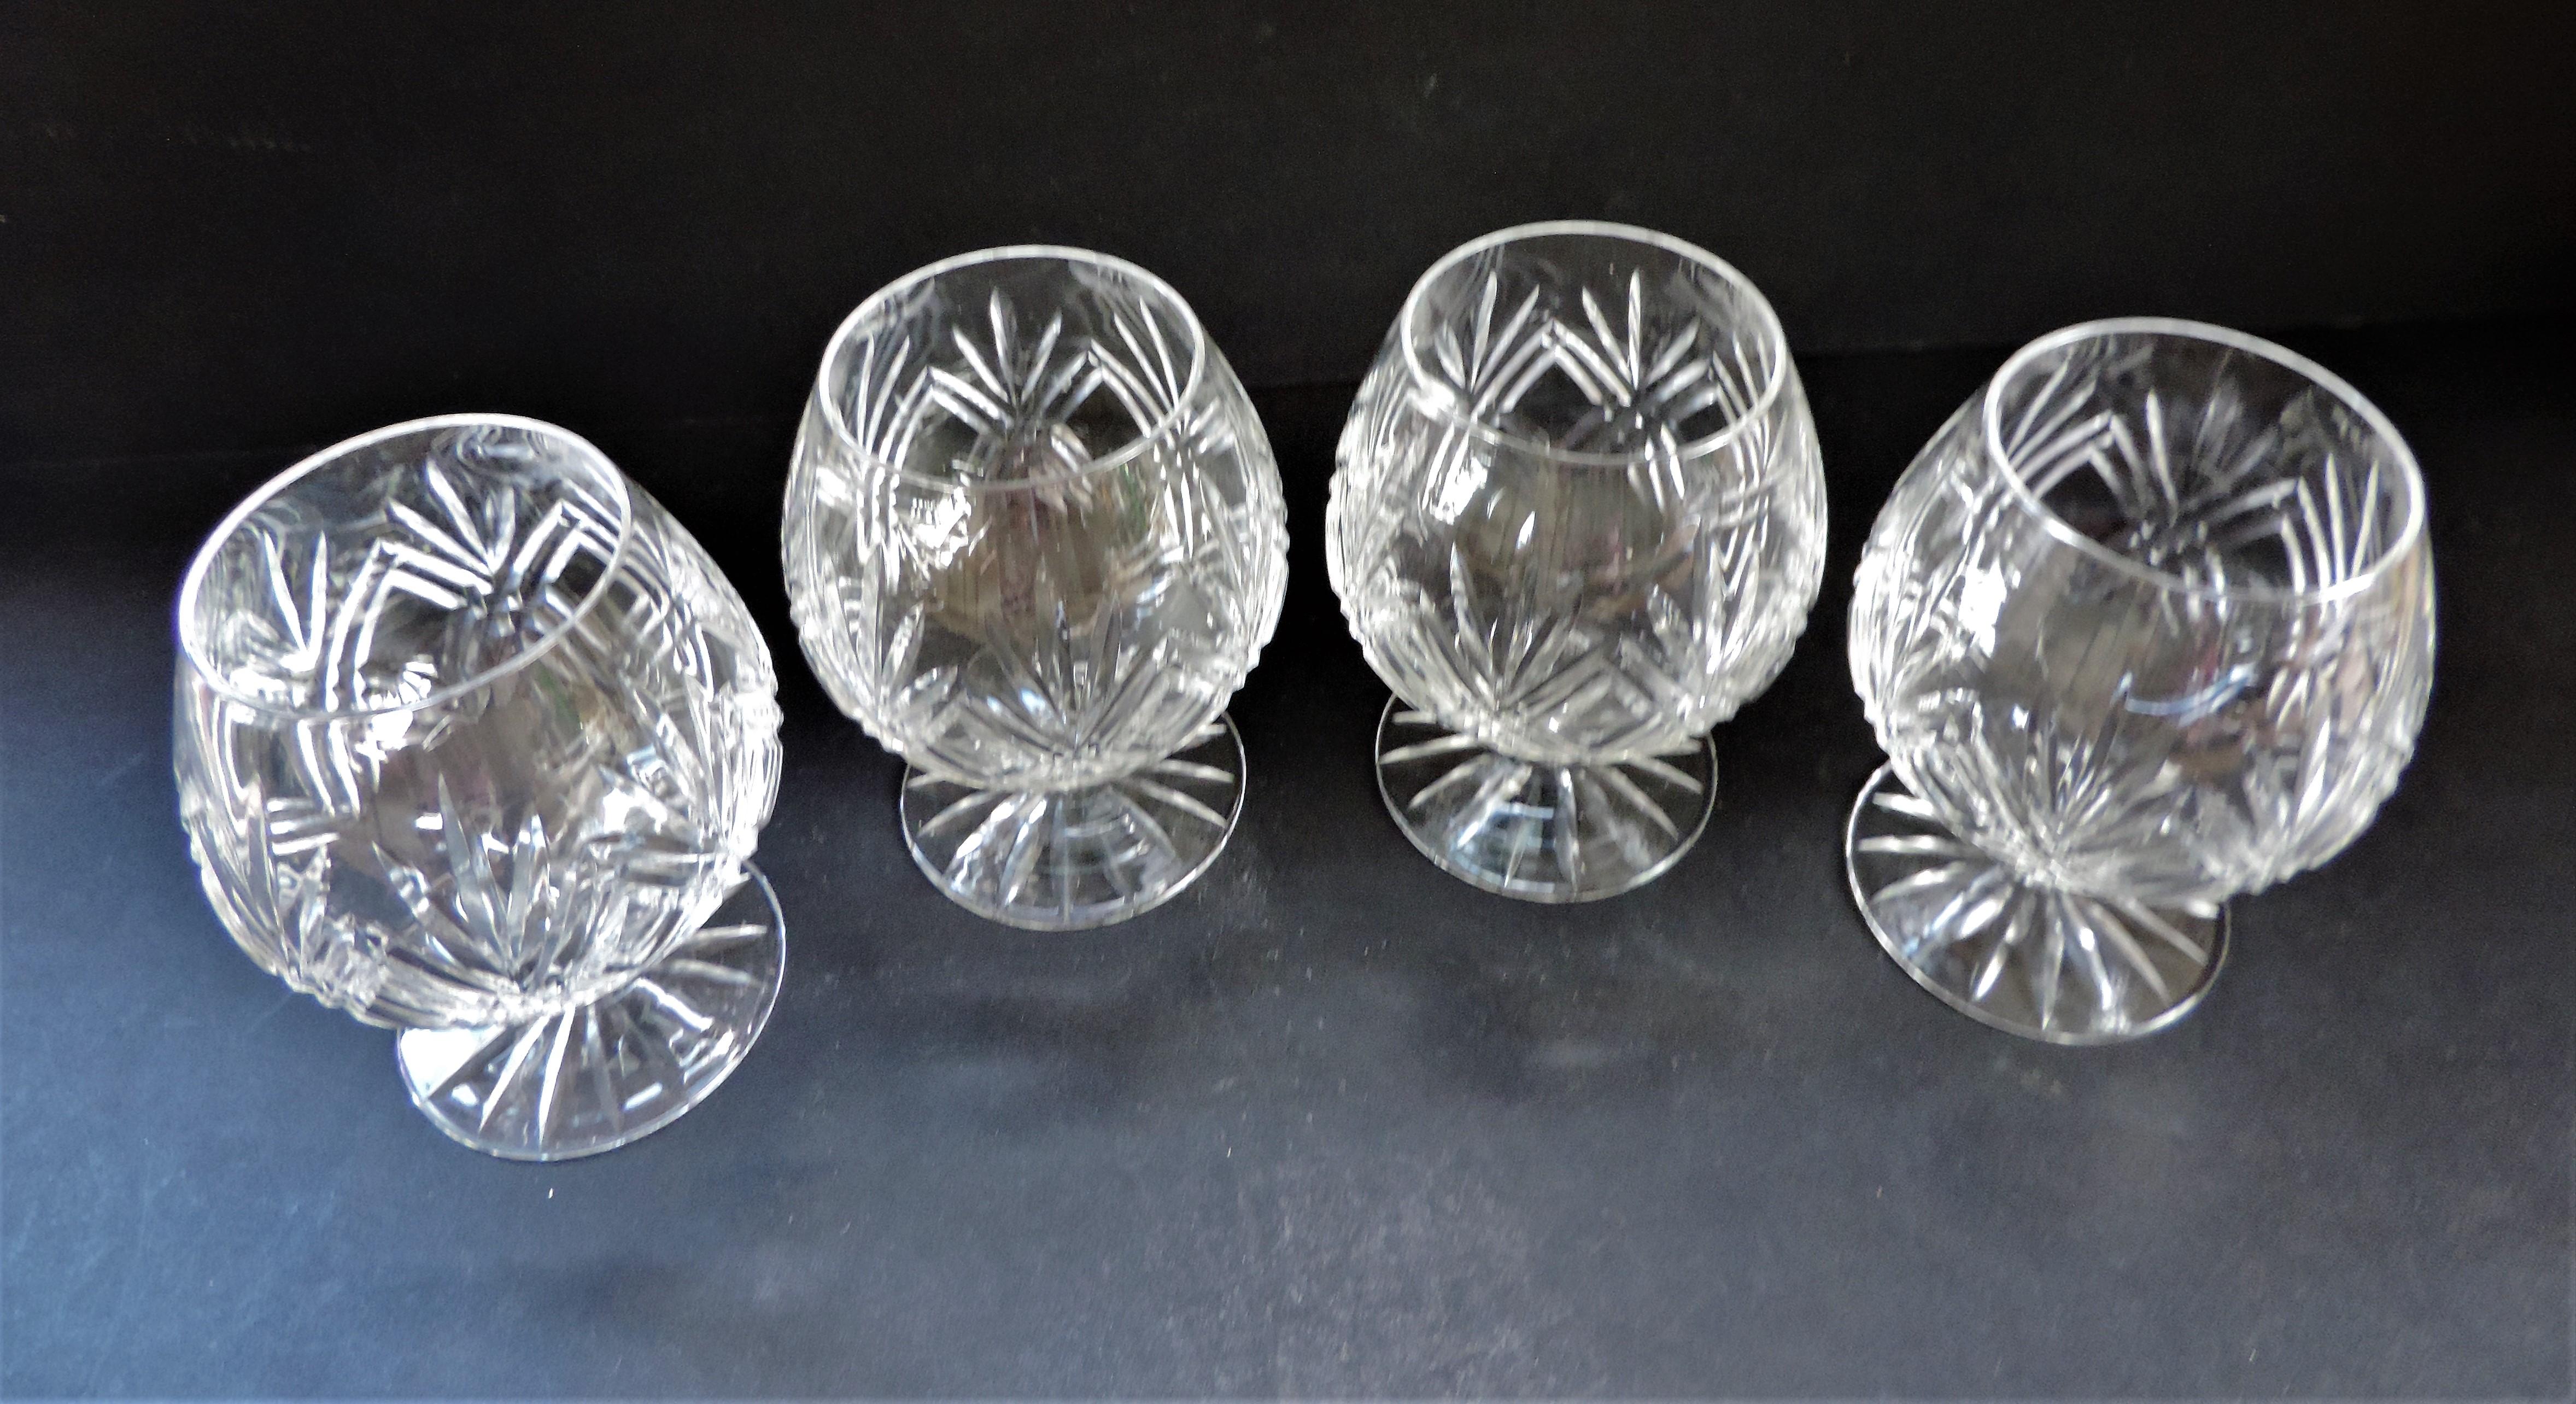 Set 4 Crystal Brandy Glasses - Image 2 of 3